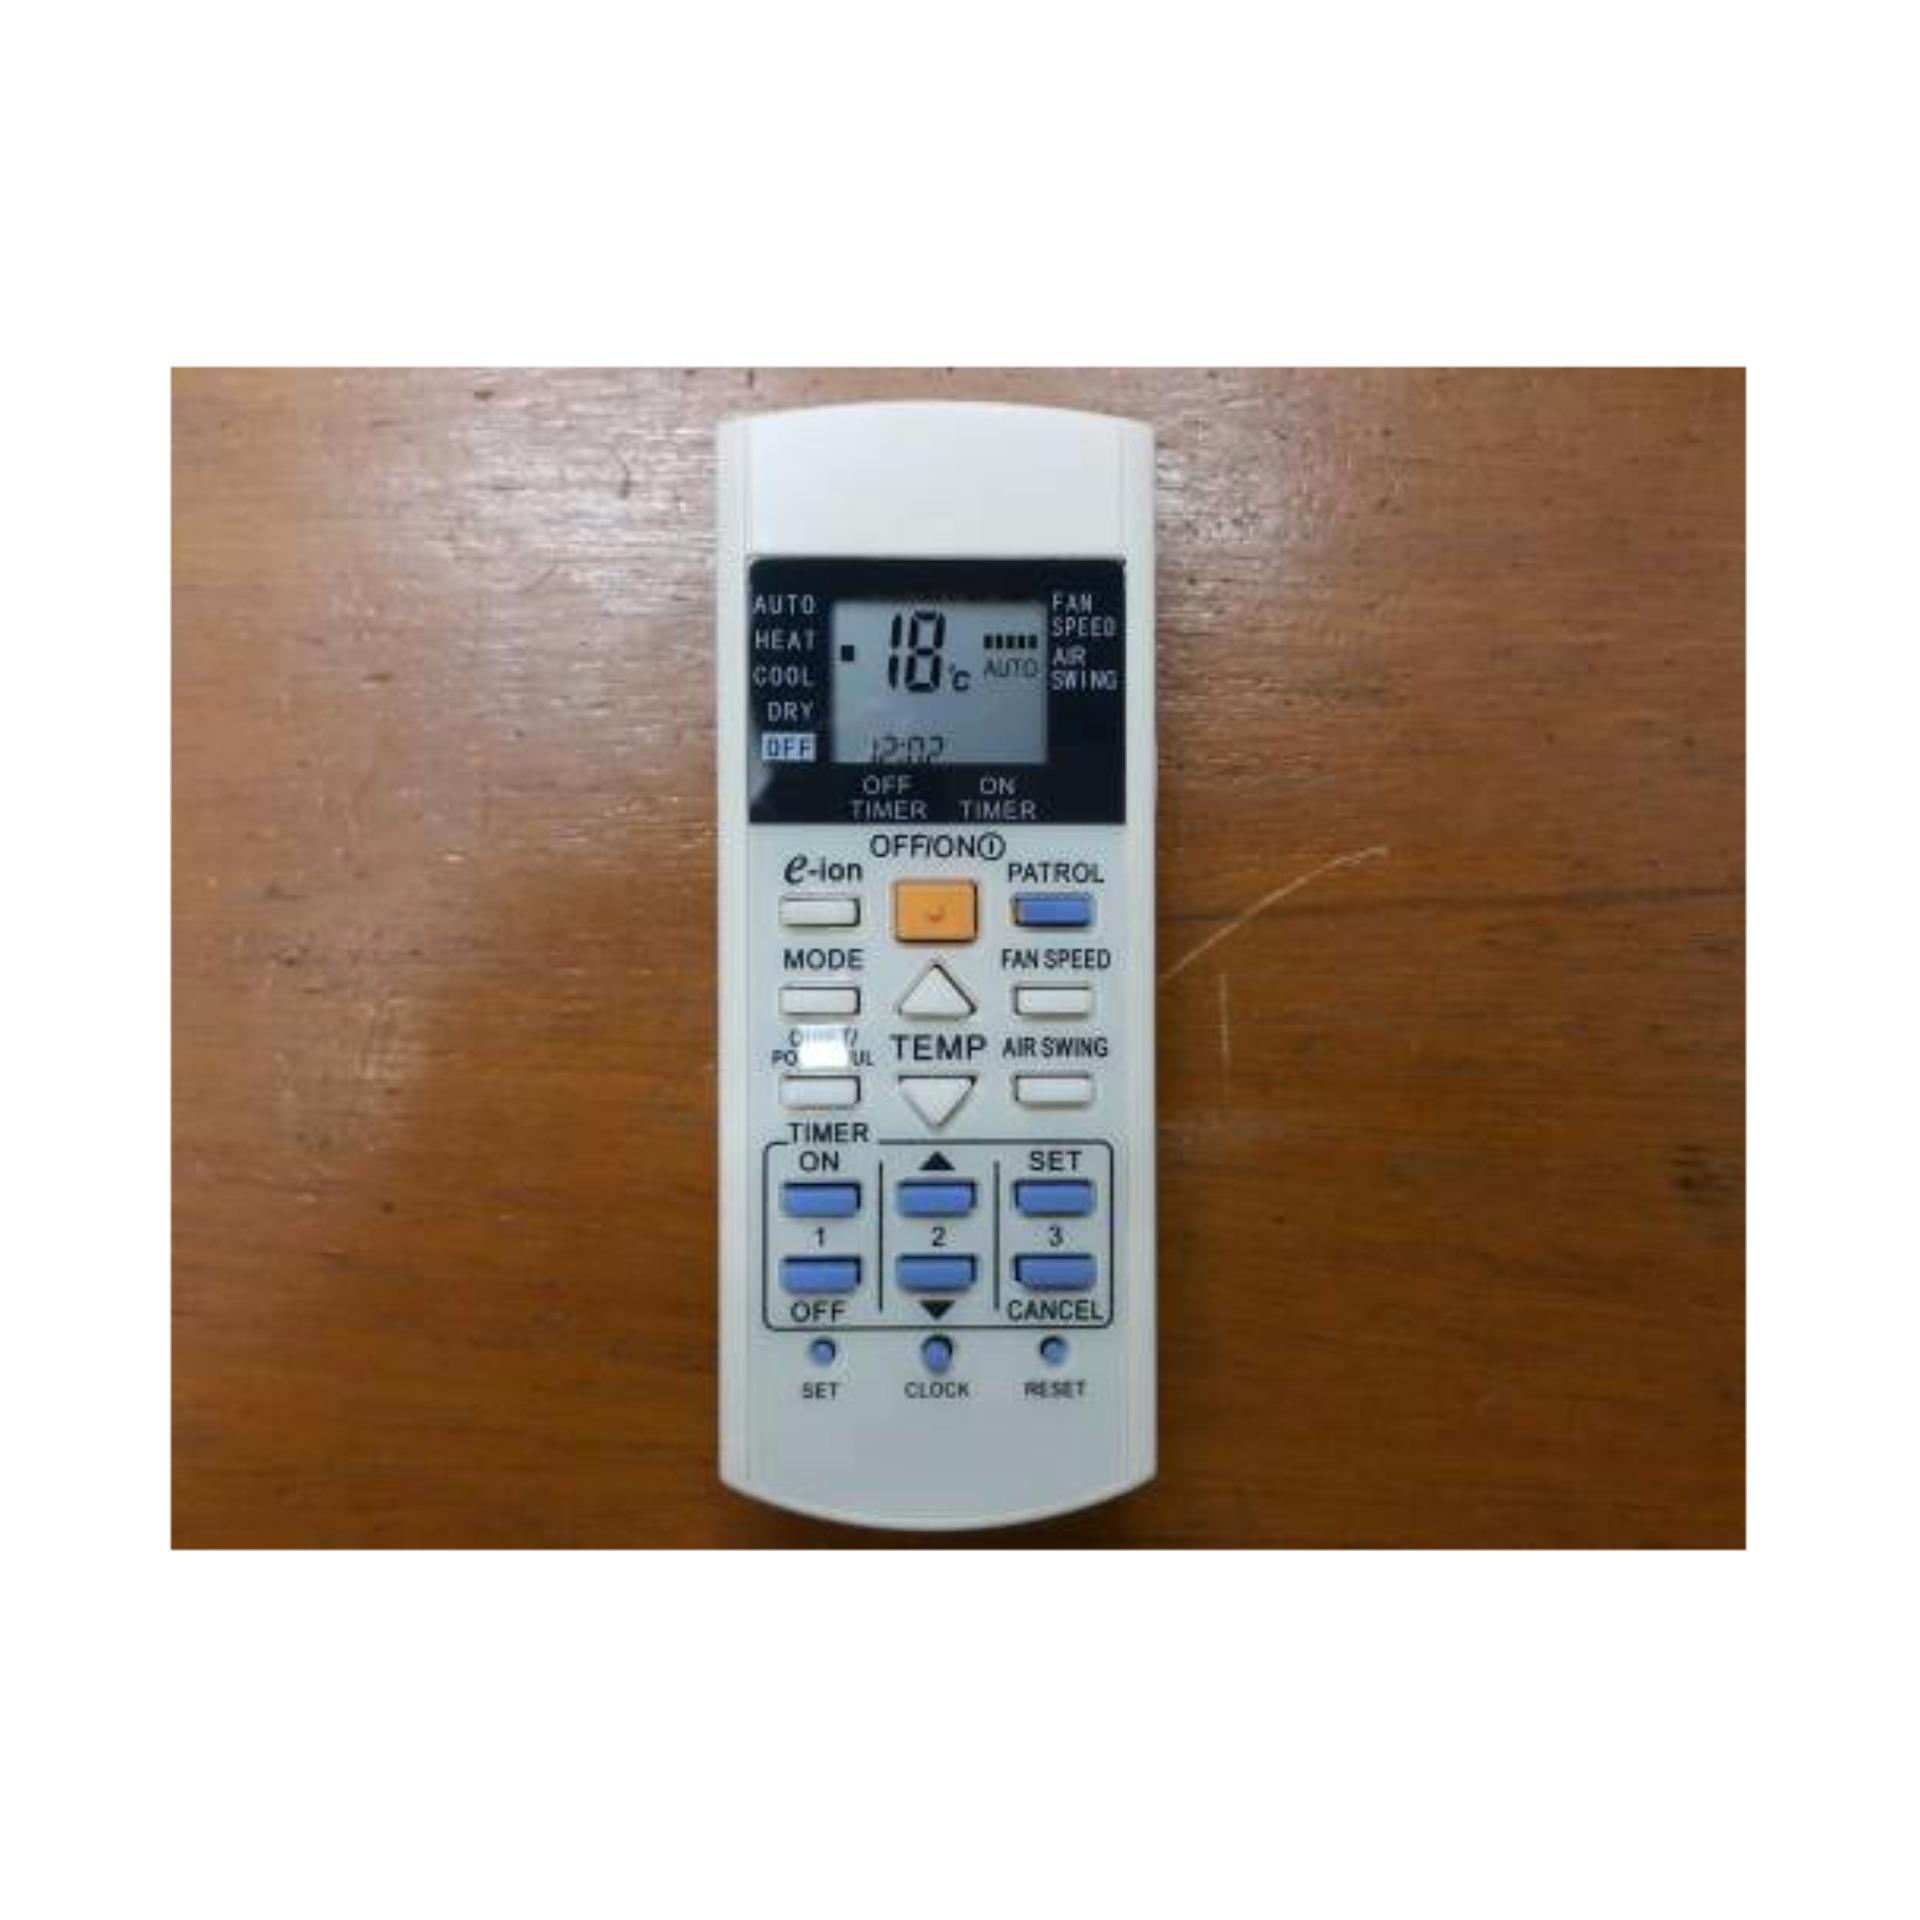 Panasonic Eion Patrol Remote Control AC - Putih